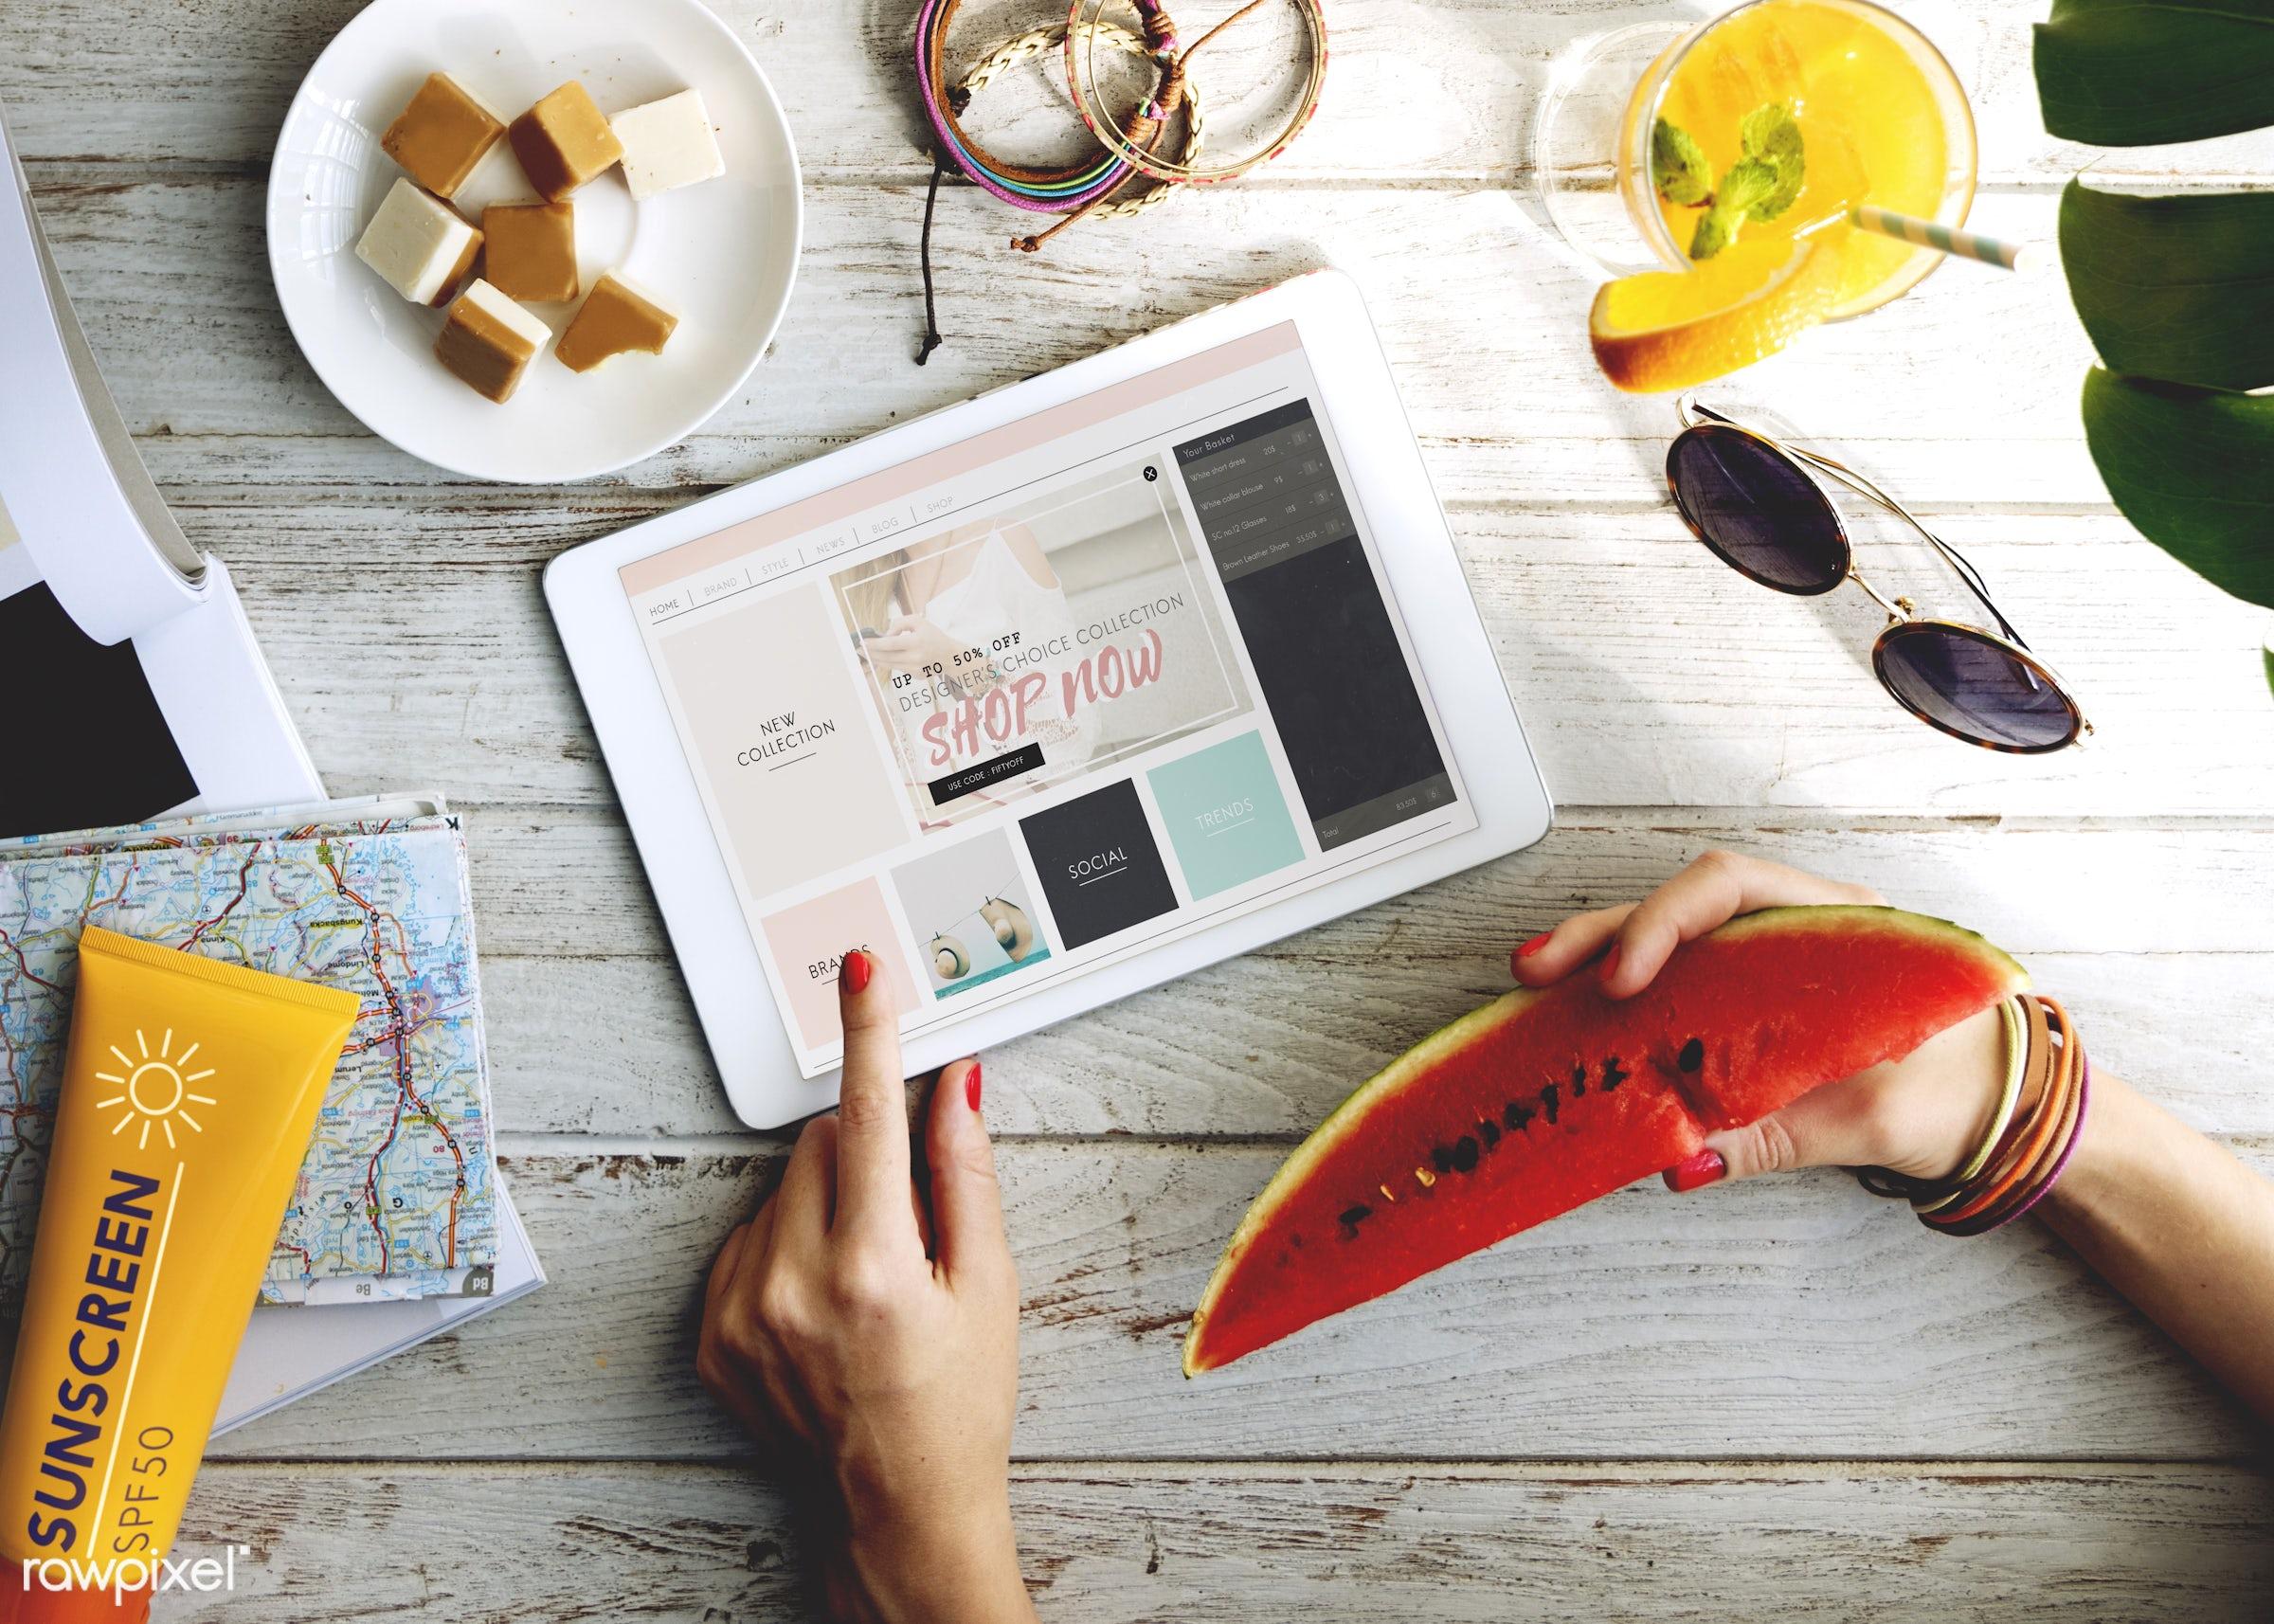 shopping, tablet, technology, summer, mock up, aerial, break, citrus, device, digital, digital device, digital tablet, fresh...